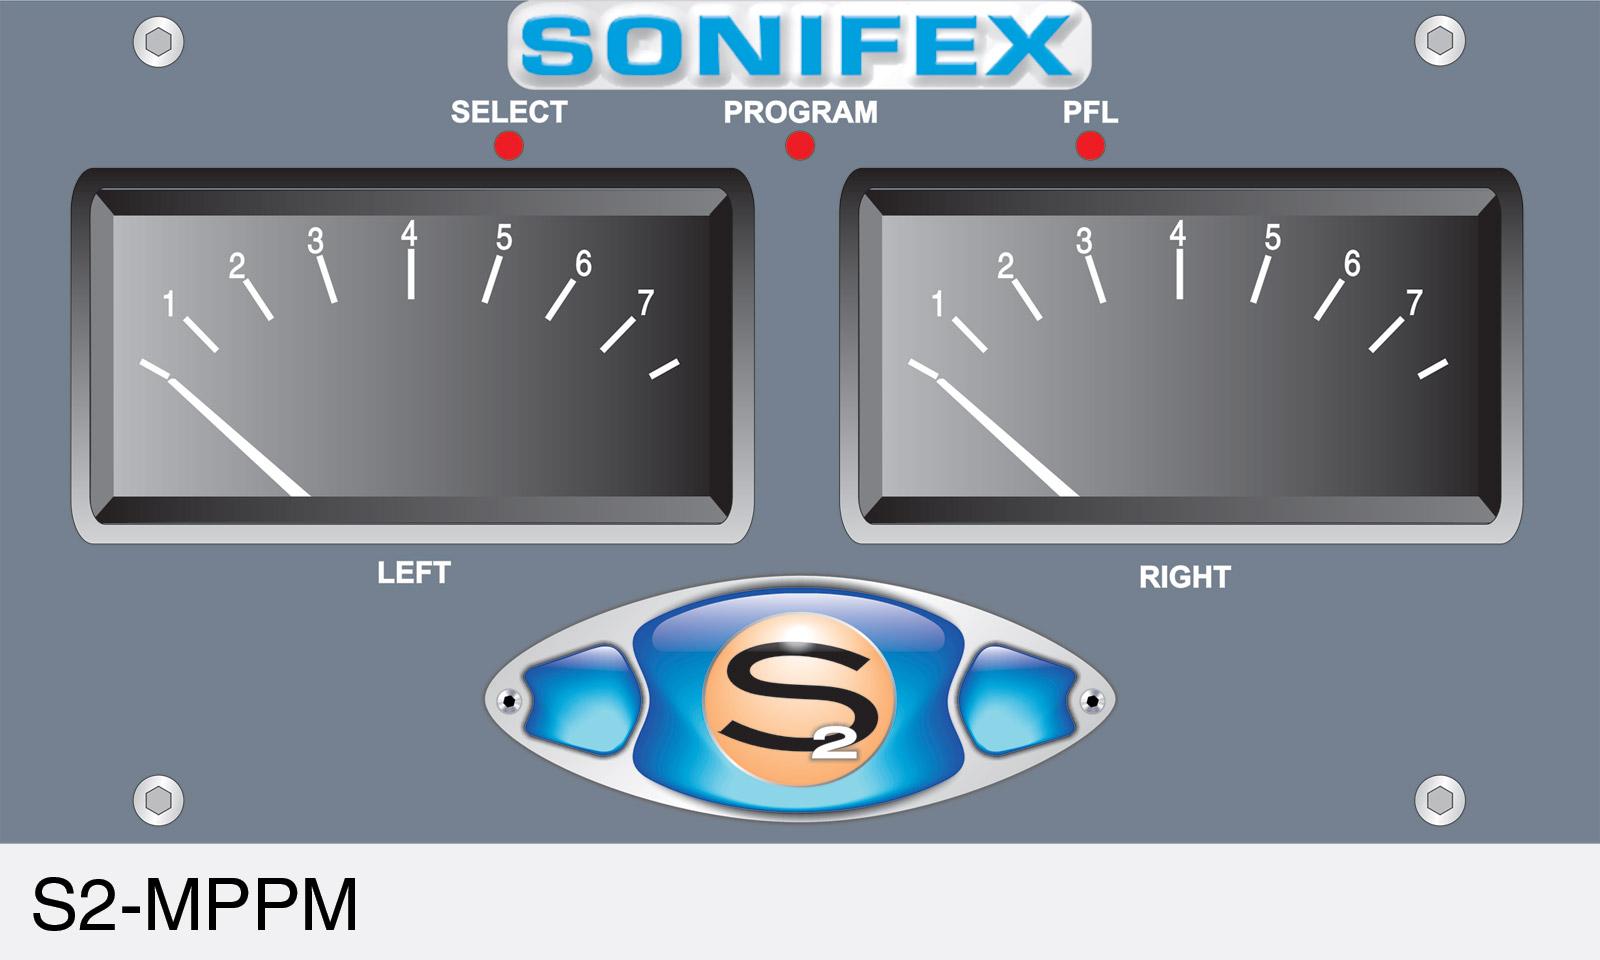 Sonifex S2 Mixer Mppm Ppm Meter Panel Cb Radio Wiring